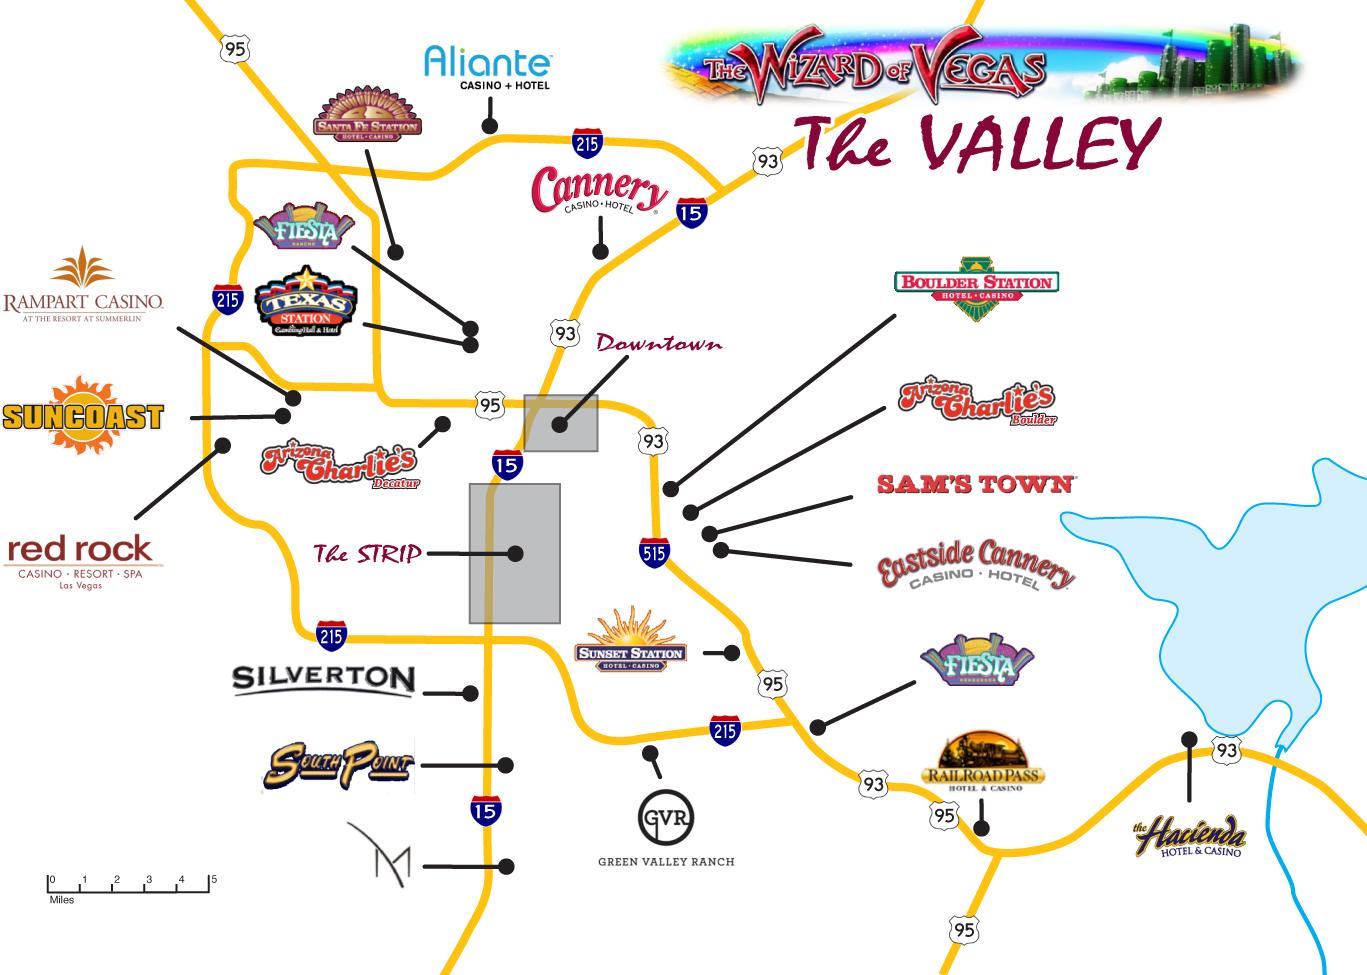 Las Vegas Maps - Wizard of Vegas